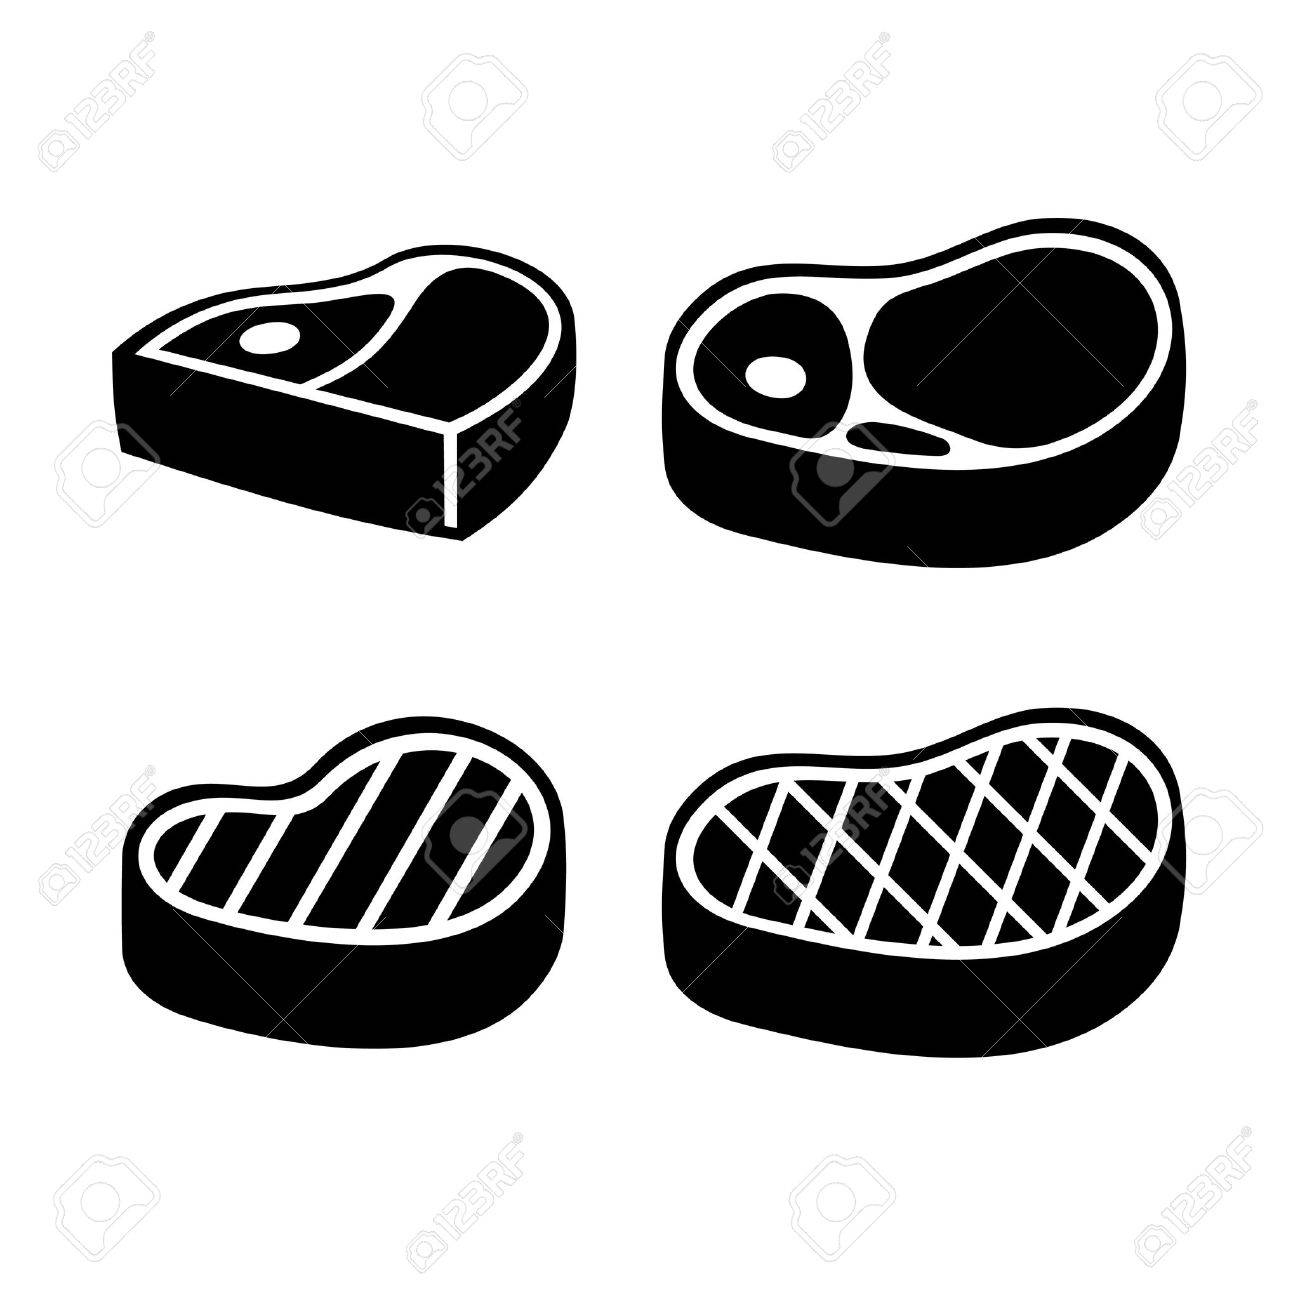 Beef Meat Steak Icons Set. Vector illustration - 35328562